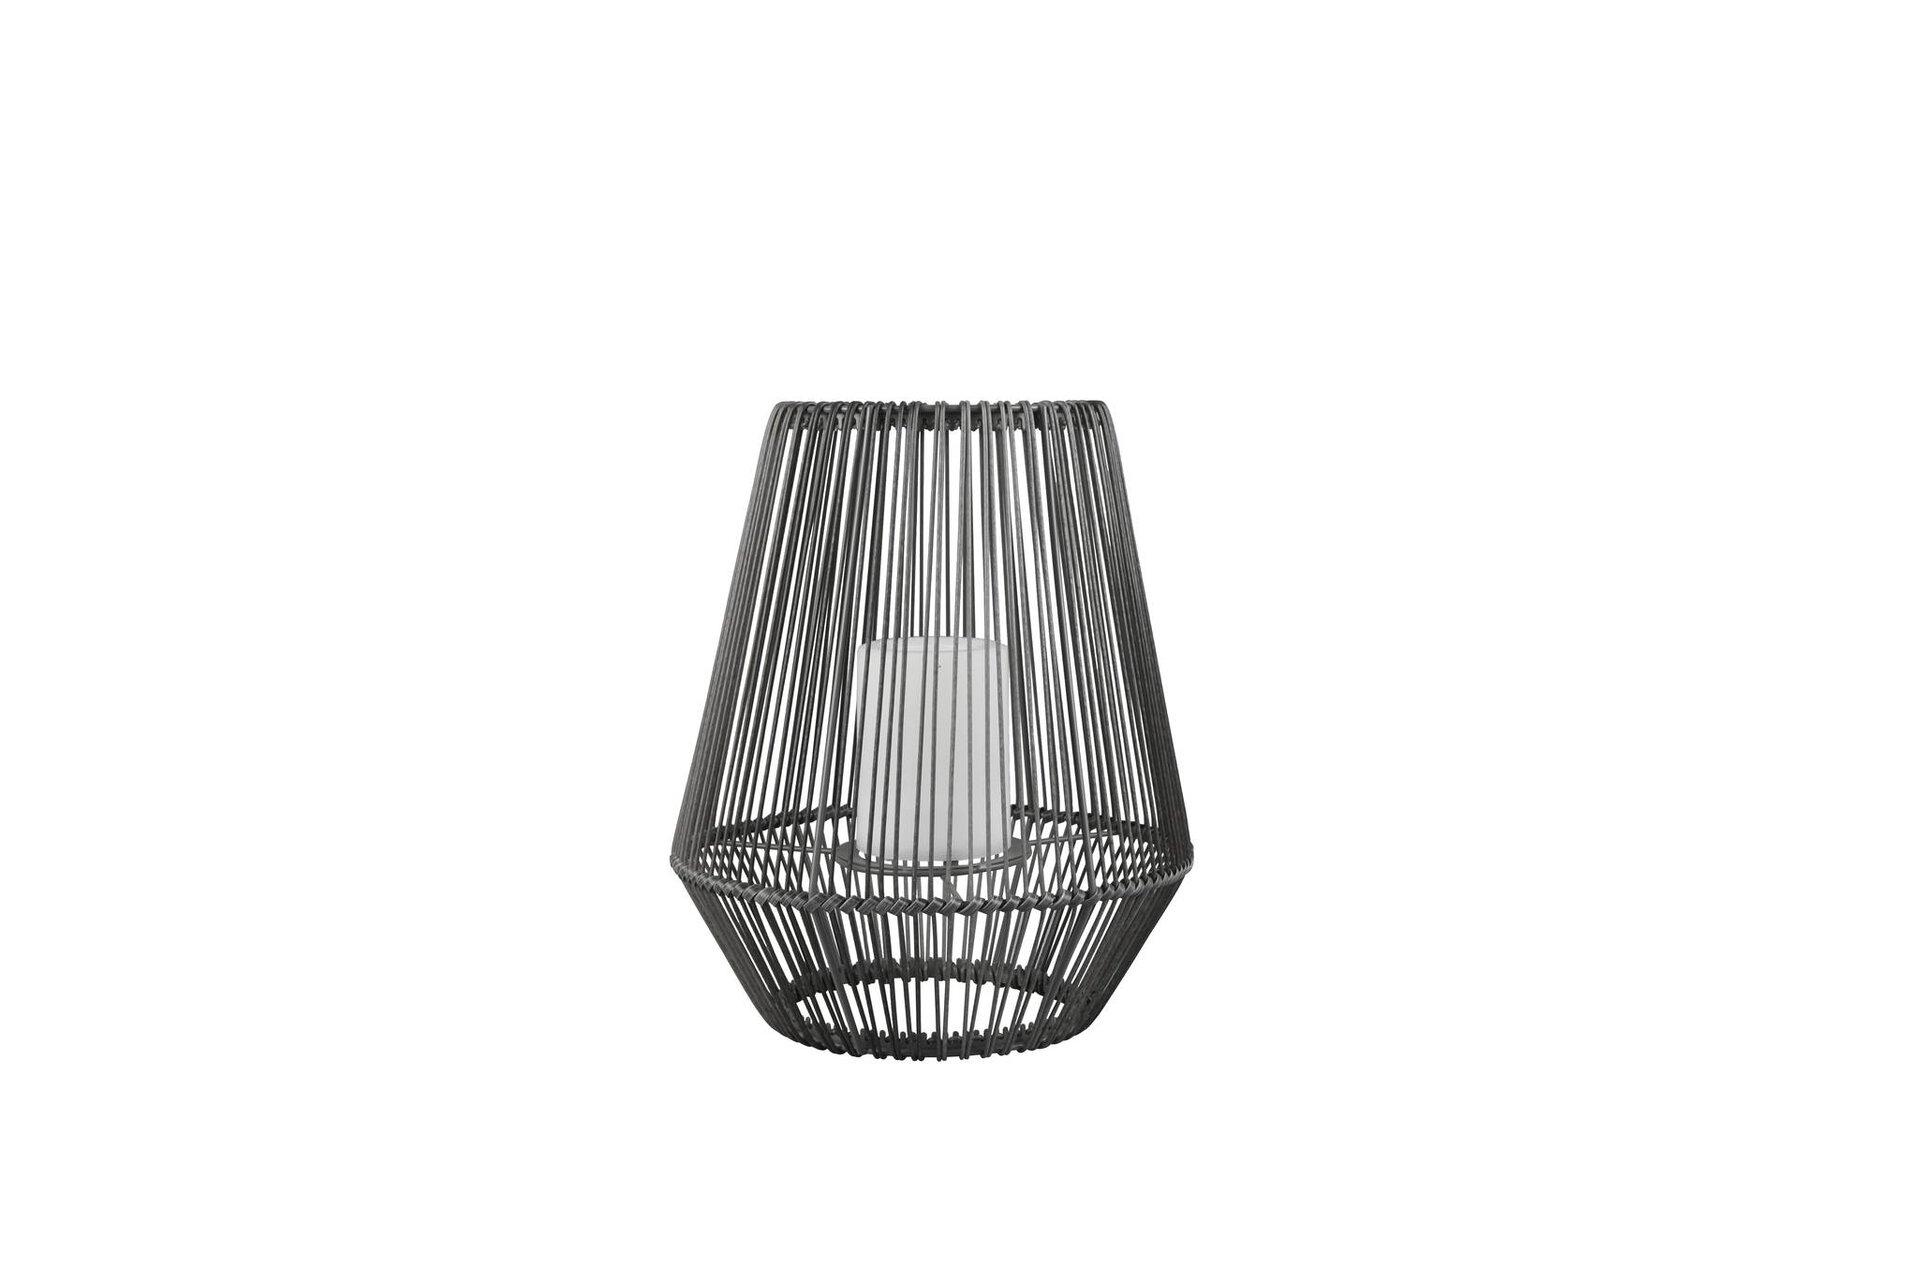 Solarleuchte MINEROS Reality Leuchten Metall grau 26 x 31 x 26 cm